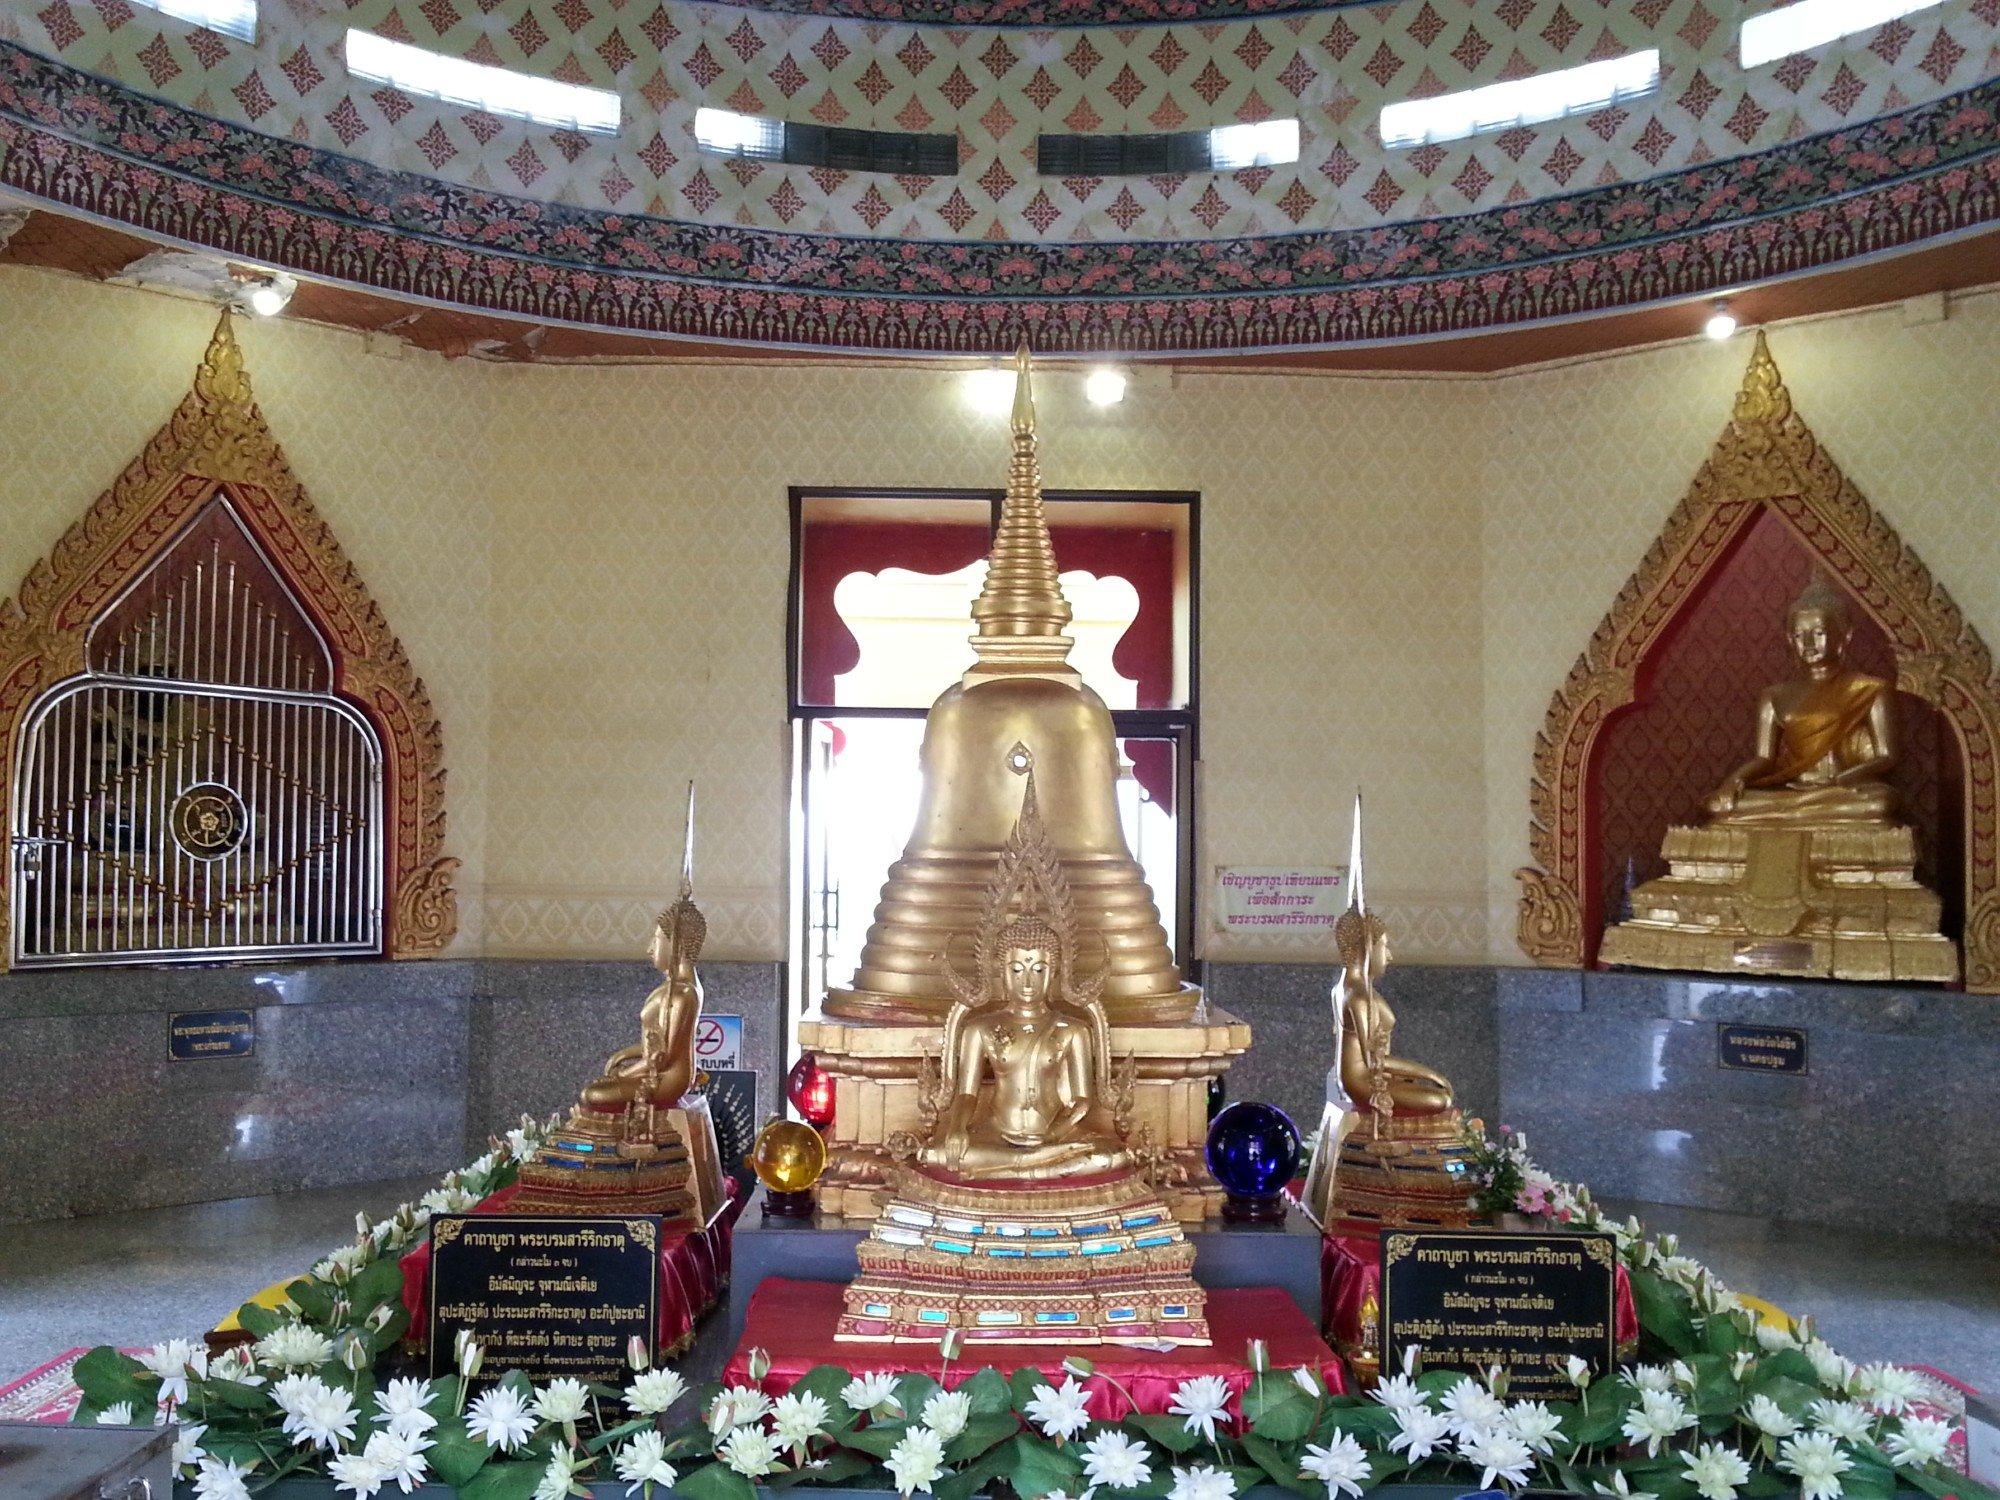 Top floor of the Phra Chulamanee Chedi